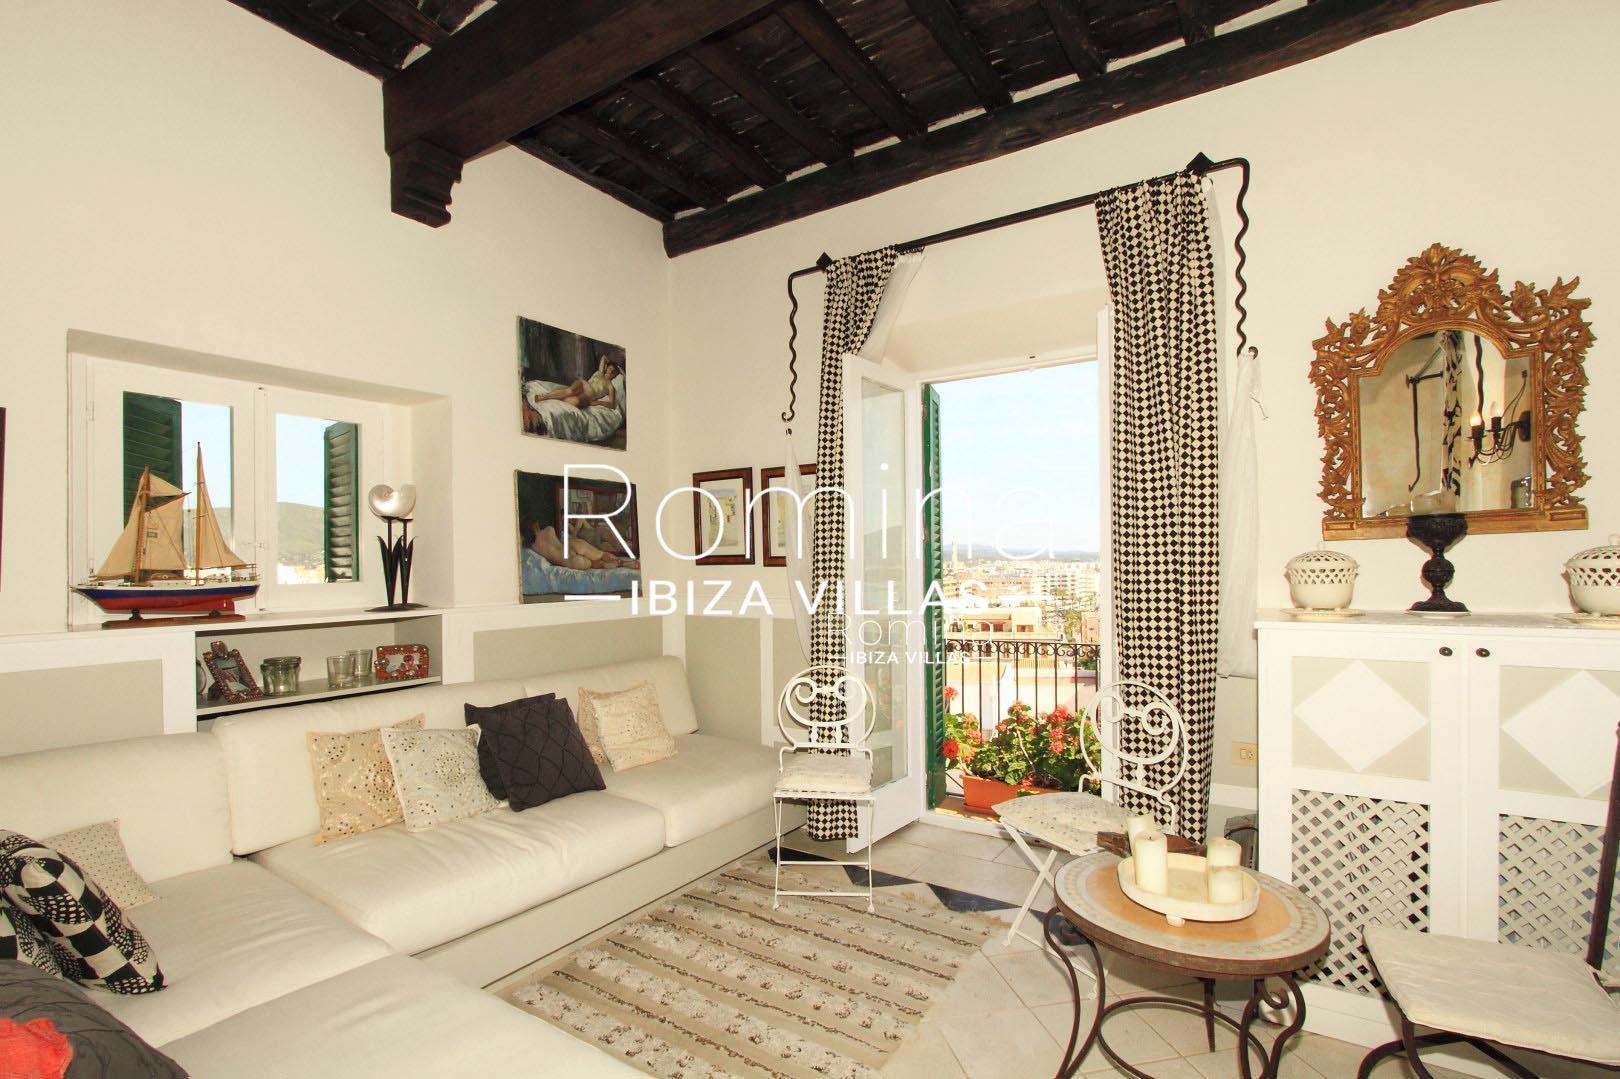 2 Bedroom Apartment for sale, Dalt Vila, Ibiza